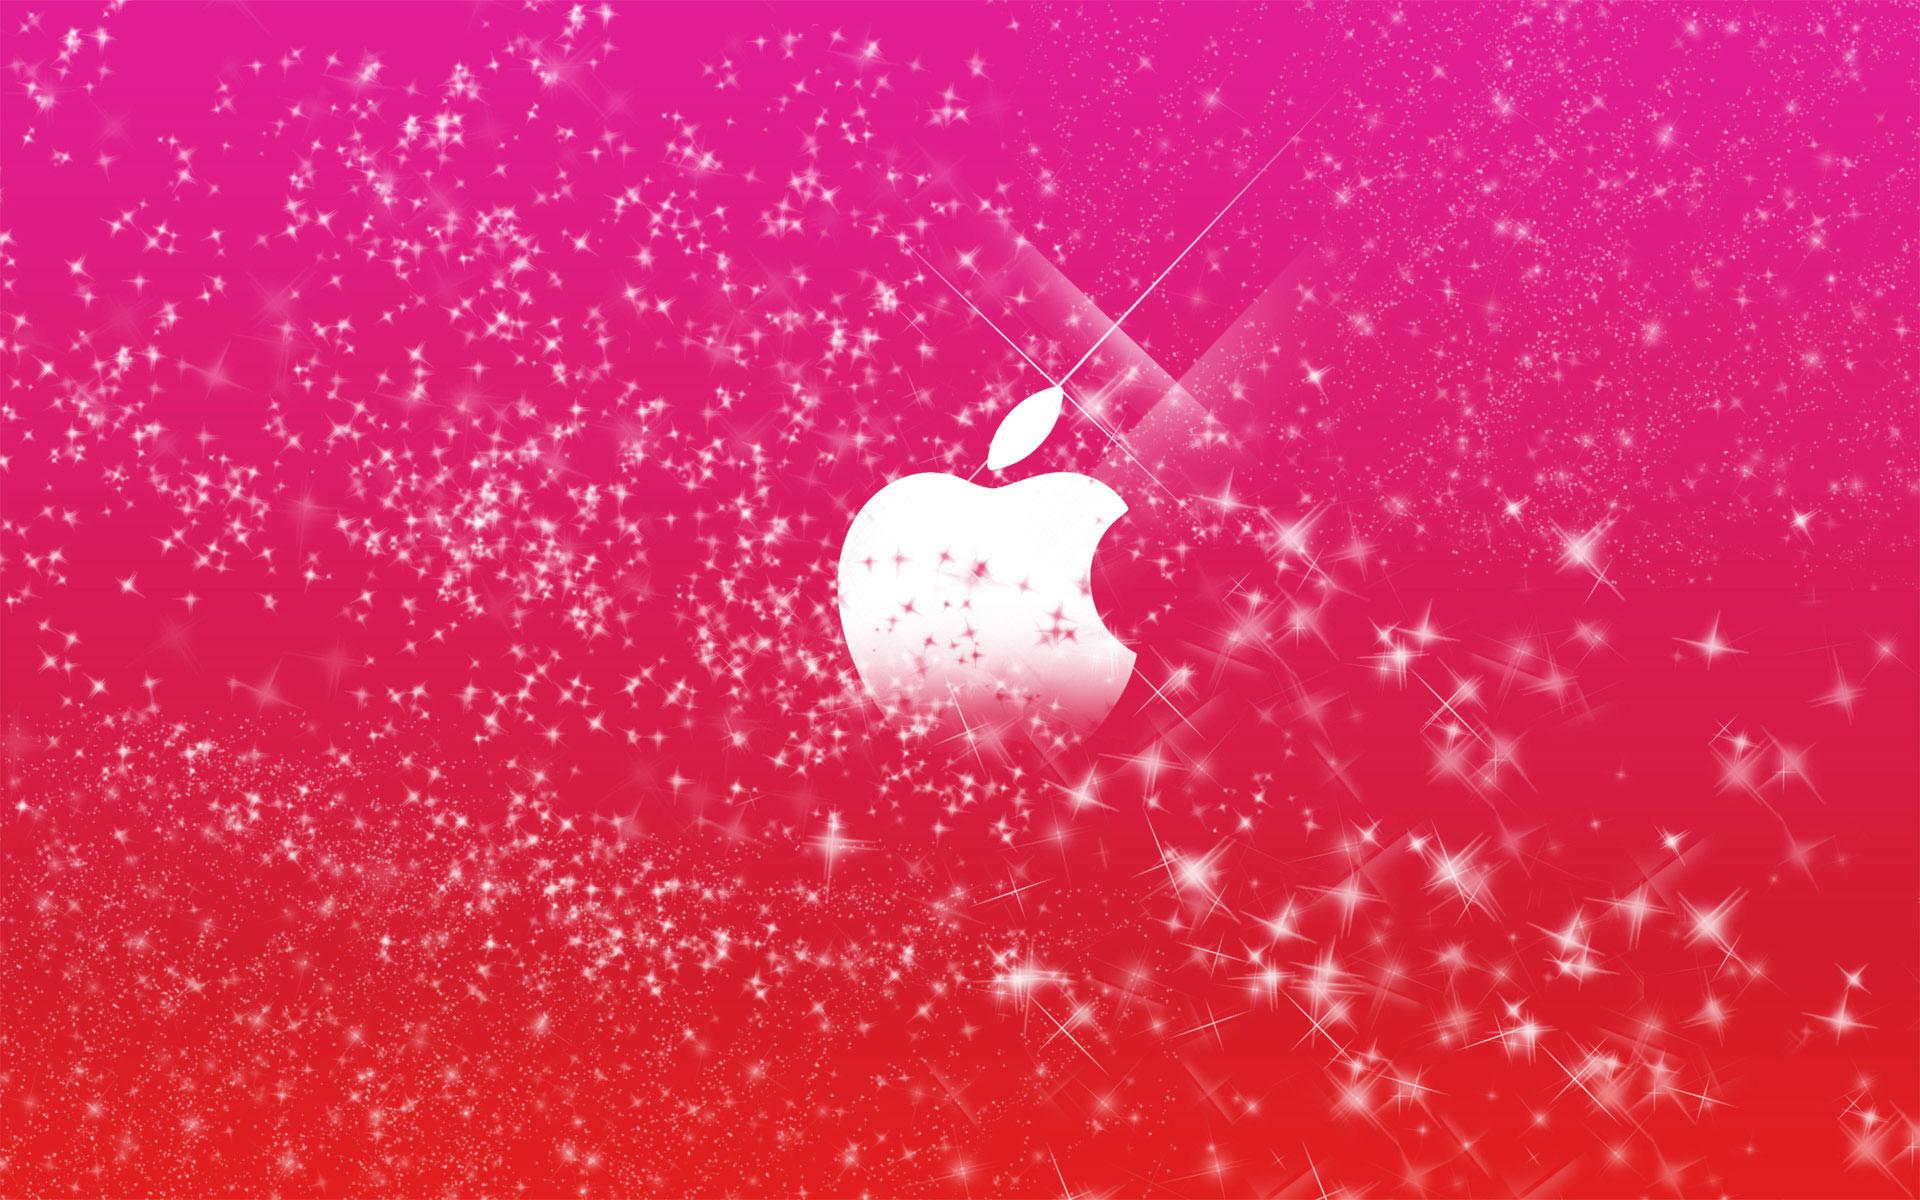 pink glitter background tumblr MEMEs